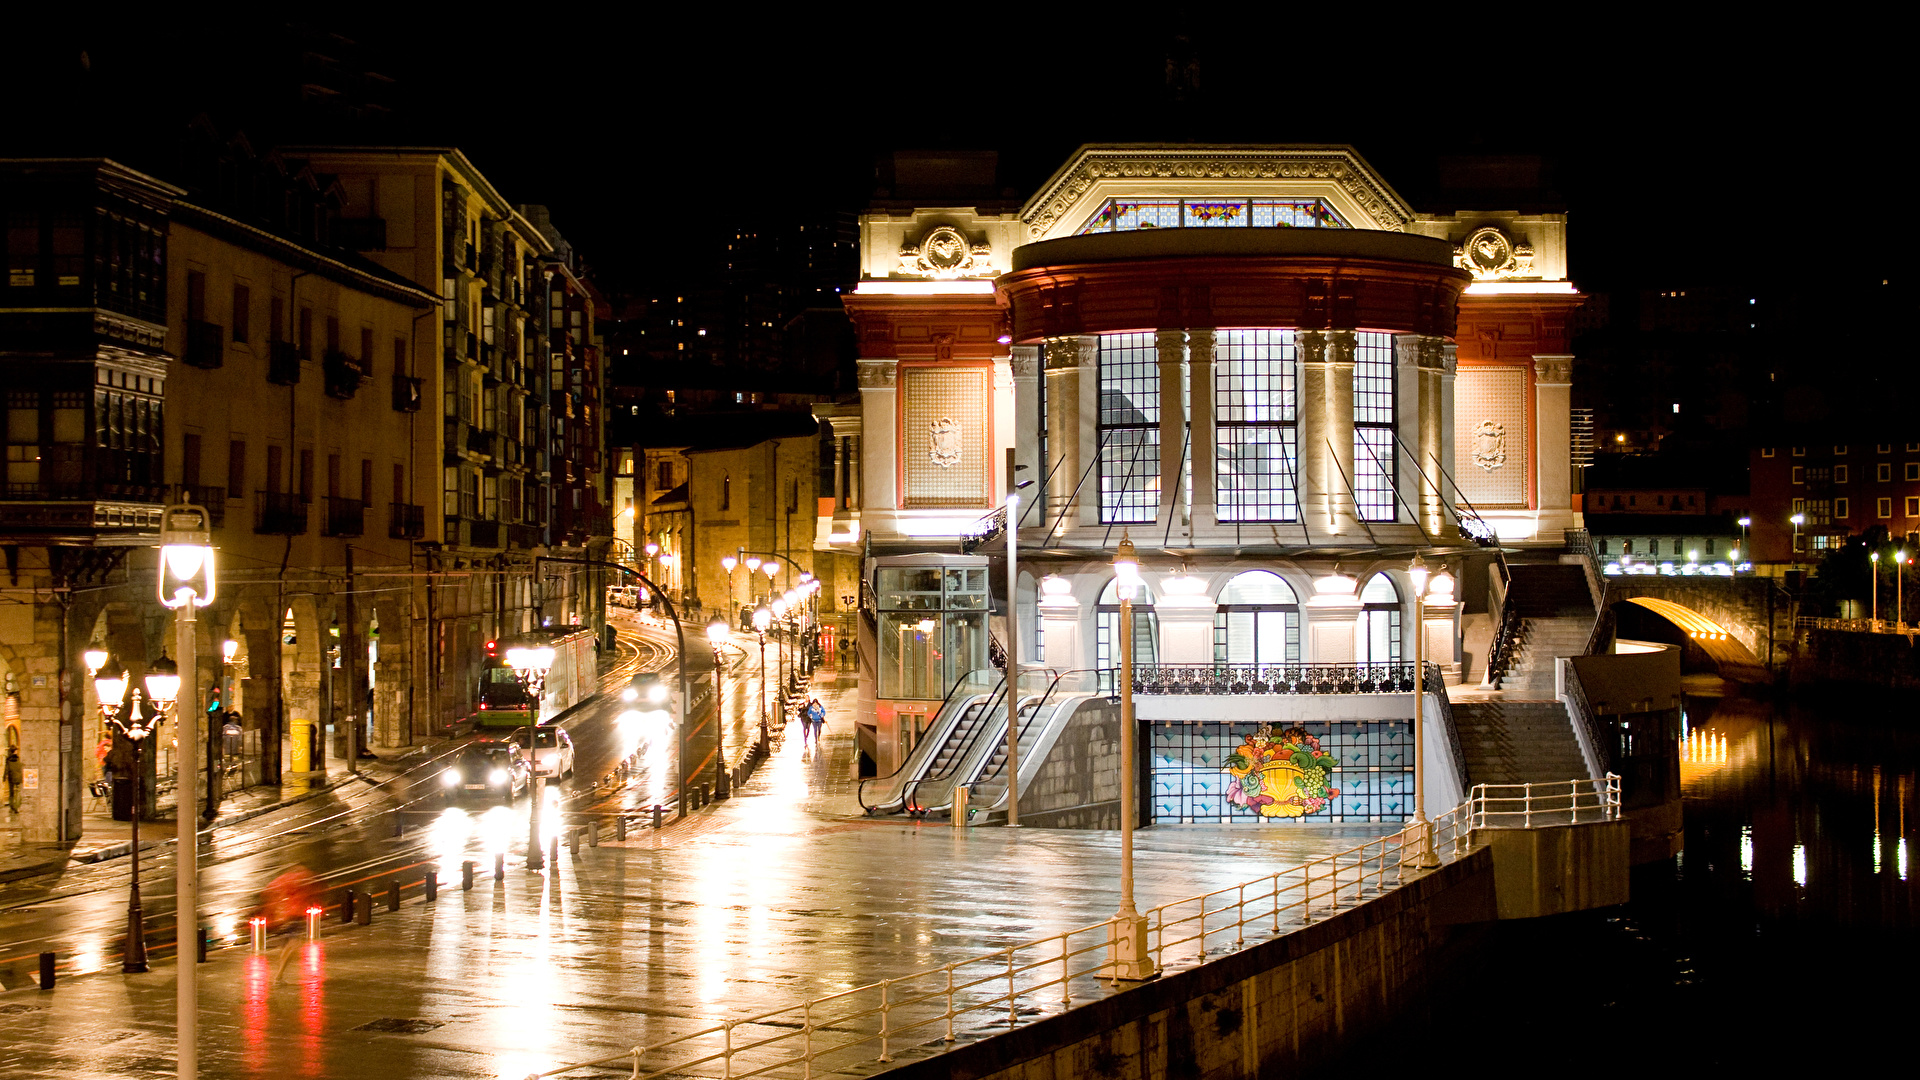 Bilbao de noche